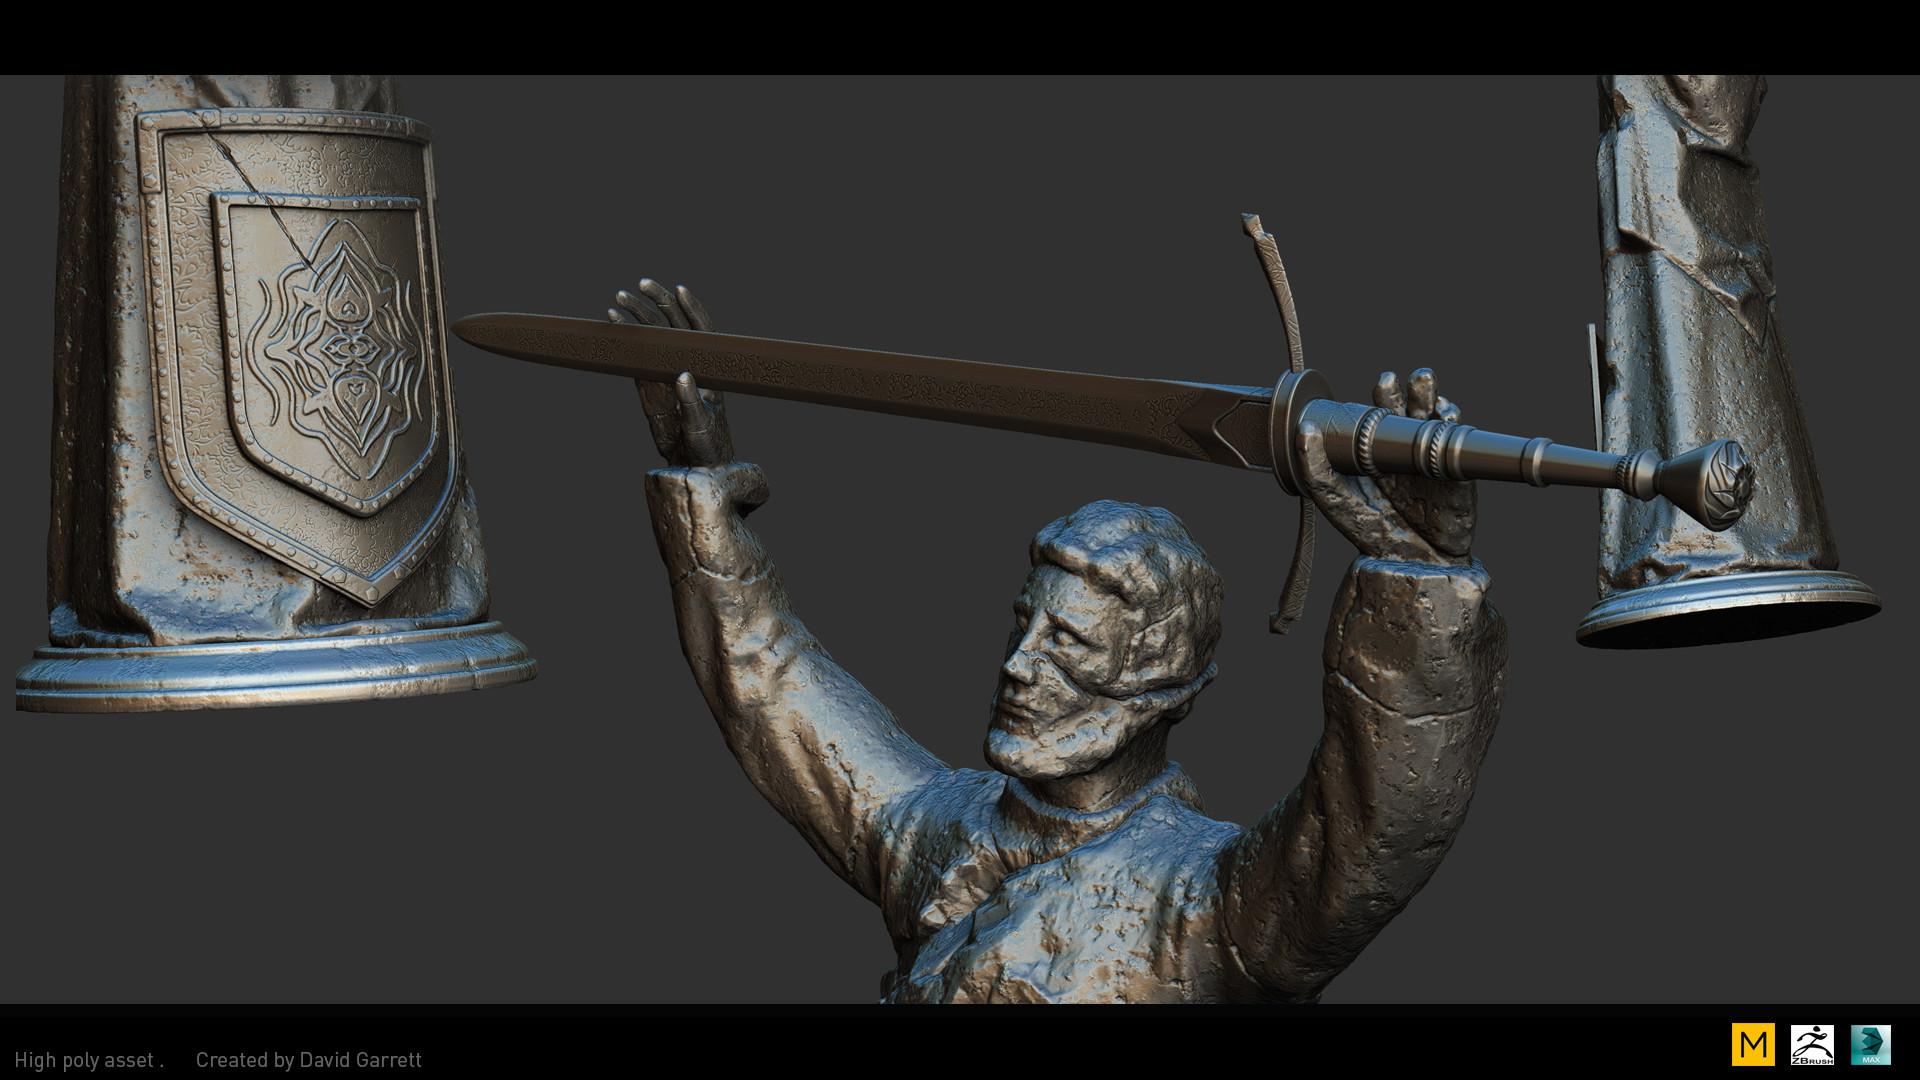 David garrett n3094311 high poly shot statue close